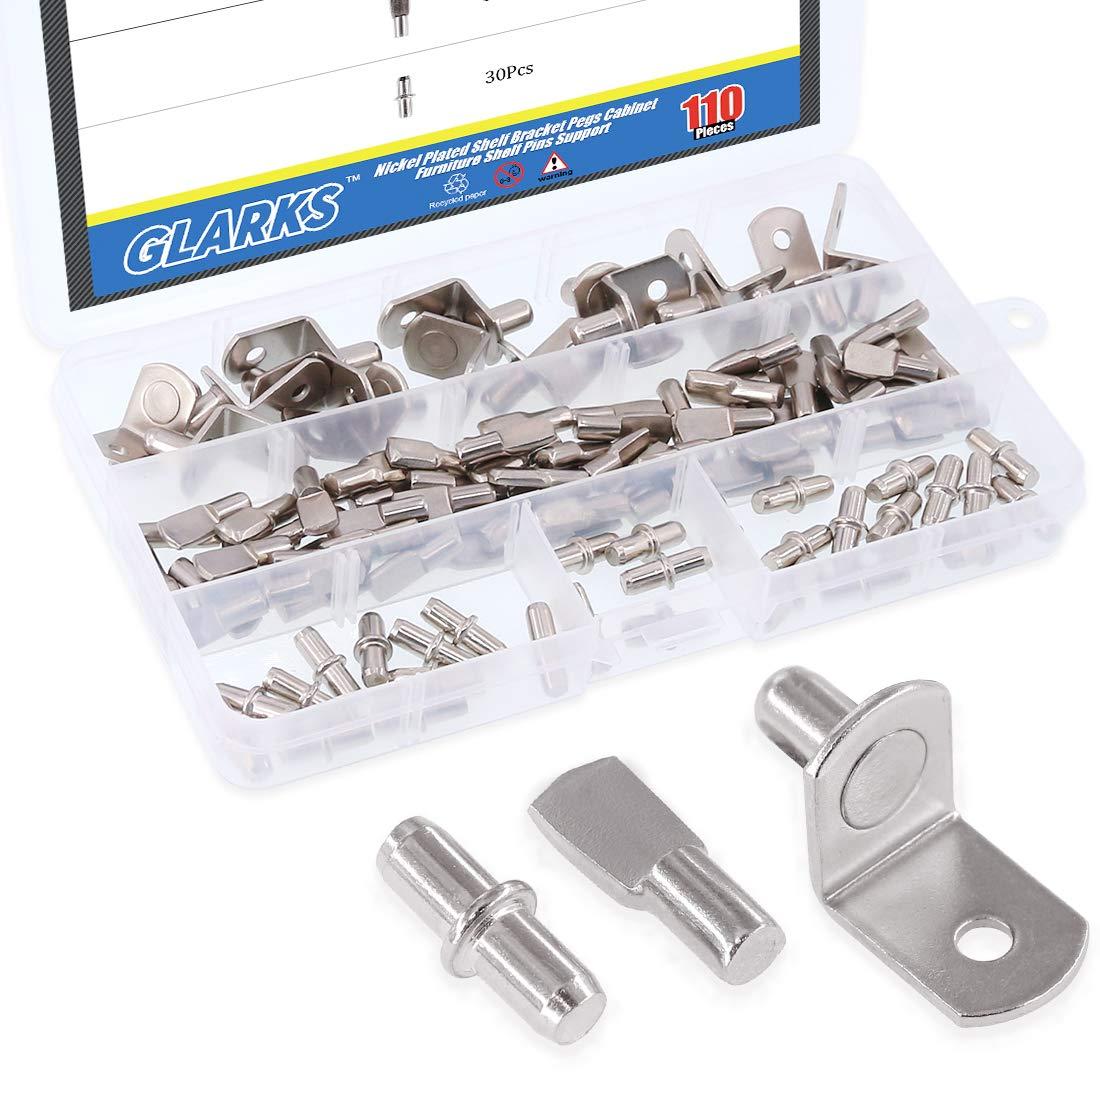 Glarks 110-Pieces Nickel Plated Shelf Bracket Pegs Cabinet Furniture Shelf Pins Support 3 Styles - Silver